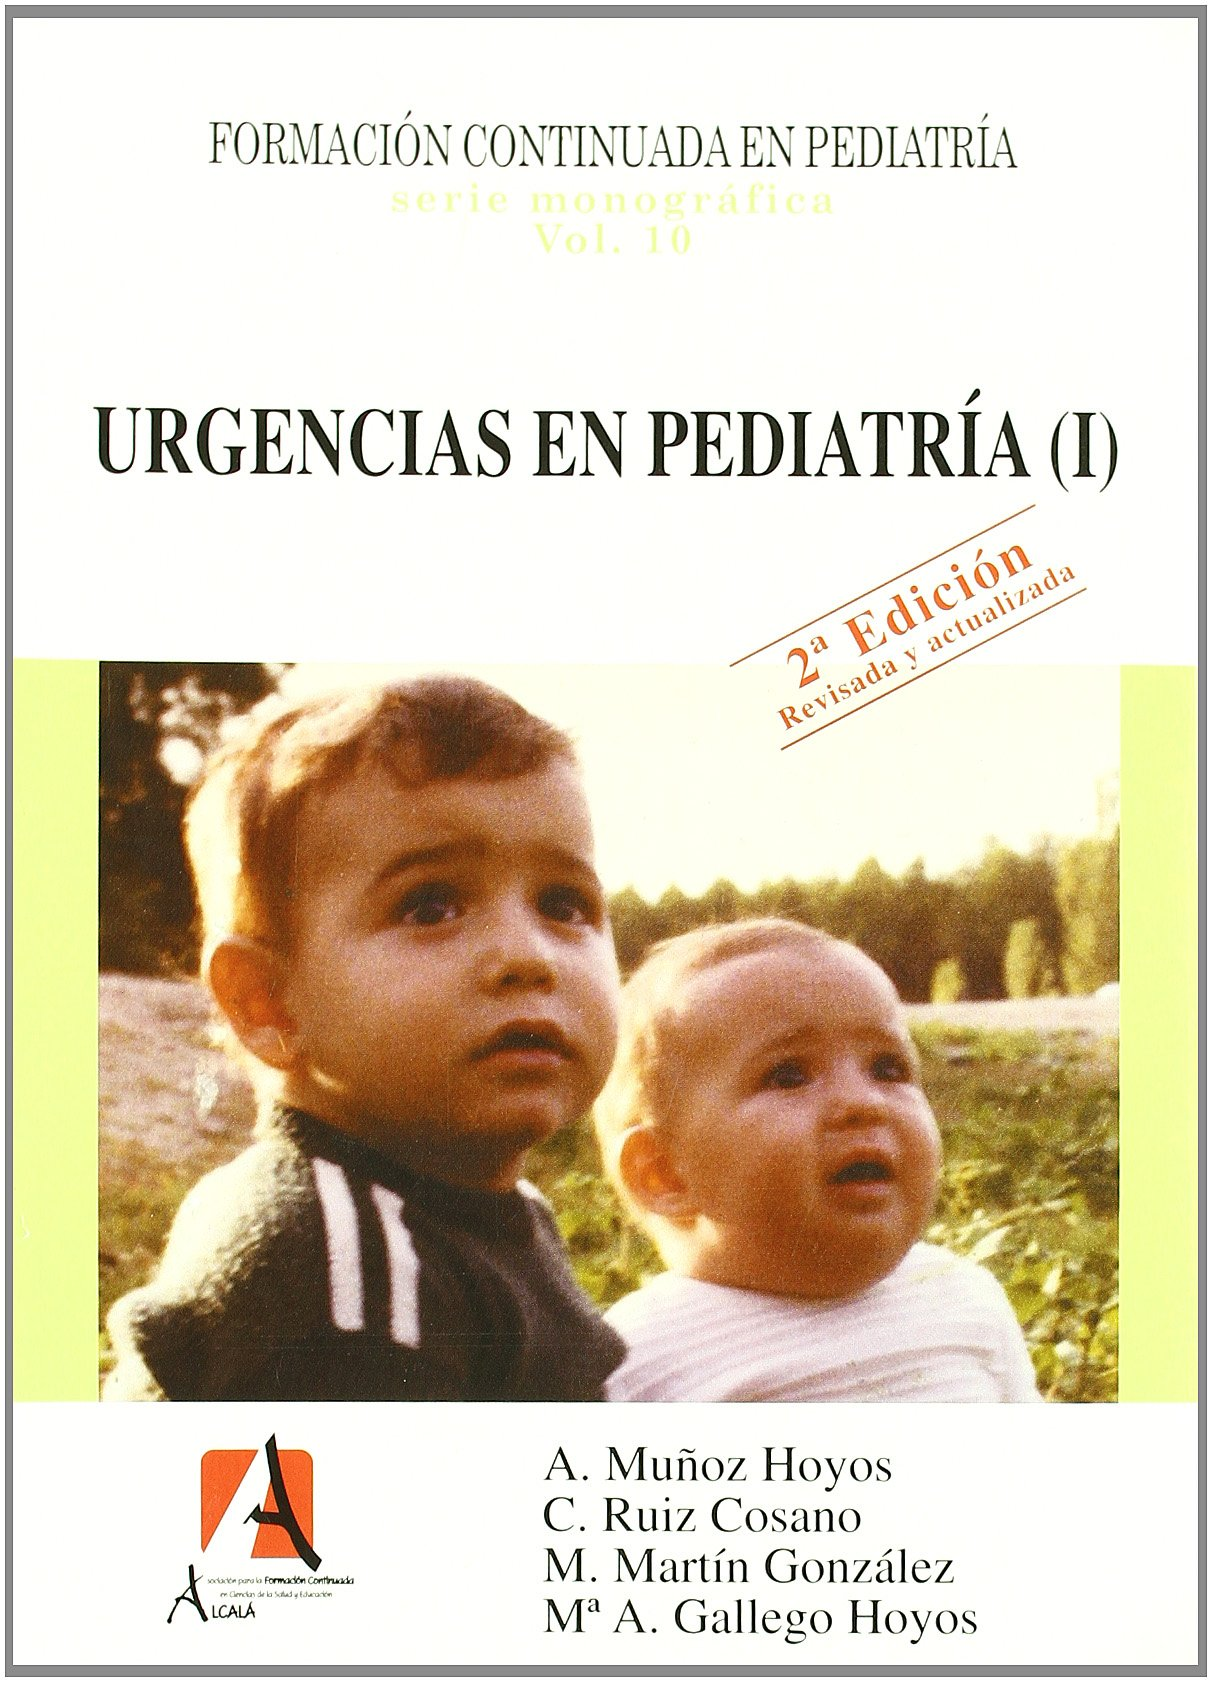 Urgencias en pediatria I / Pediatric emergency (Spanish Edition): Antonio  Munoz Hoyos, C. Ruiz Cosano: 9788495658838: Amazon.com: Books